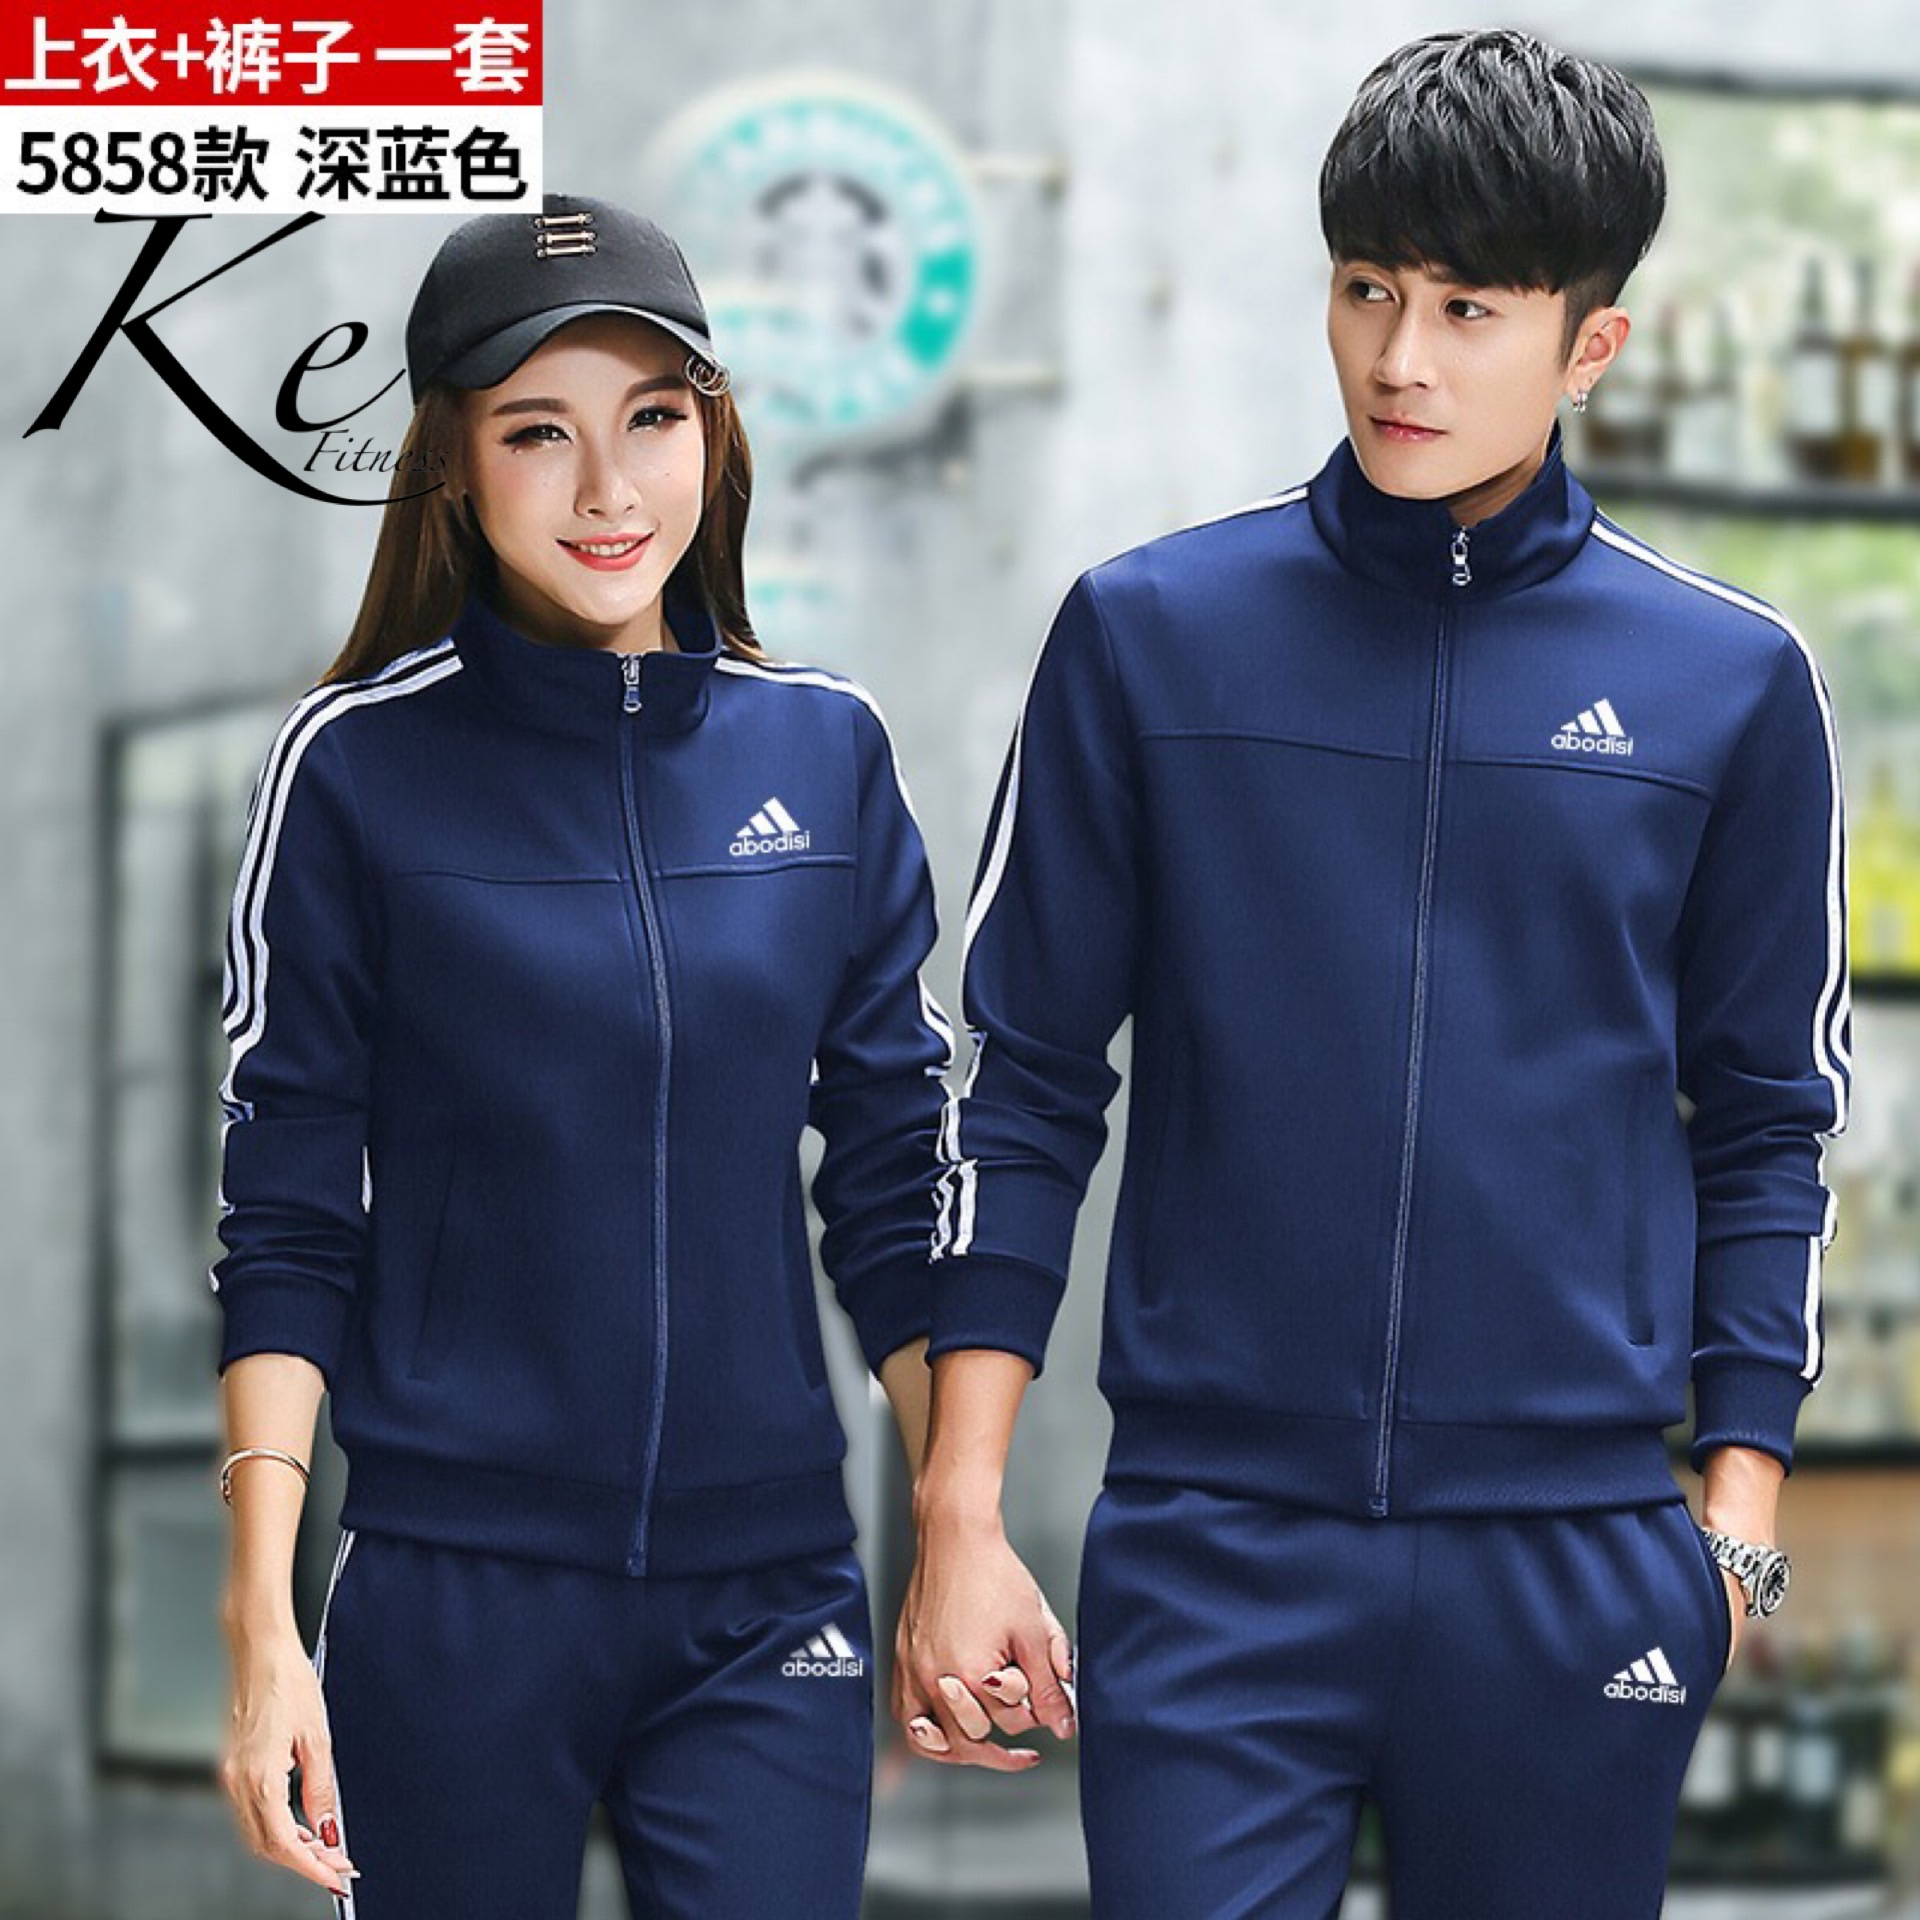 KE Autumn Blue Fashion Man Woman Casual Student Wear Men And Women Running Sports Fitness Couple Set Tracksuit Big Size Plus